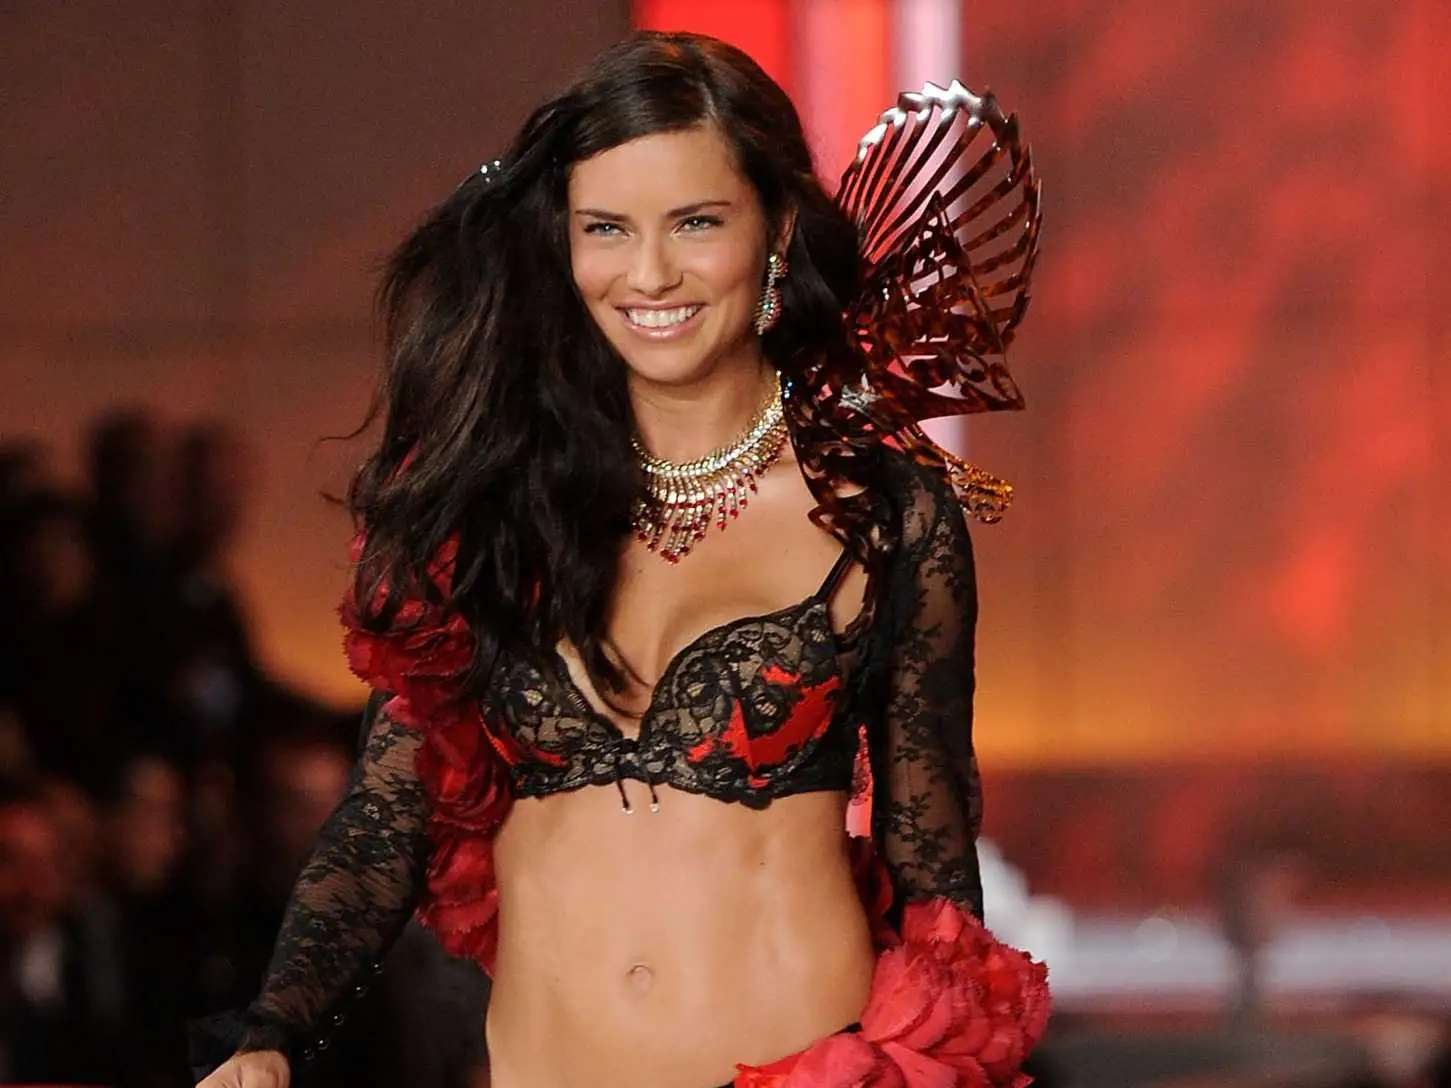 Adriana Lima walking down the runway